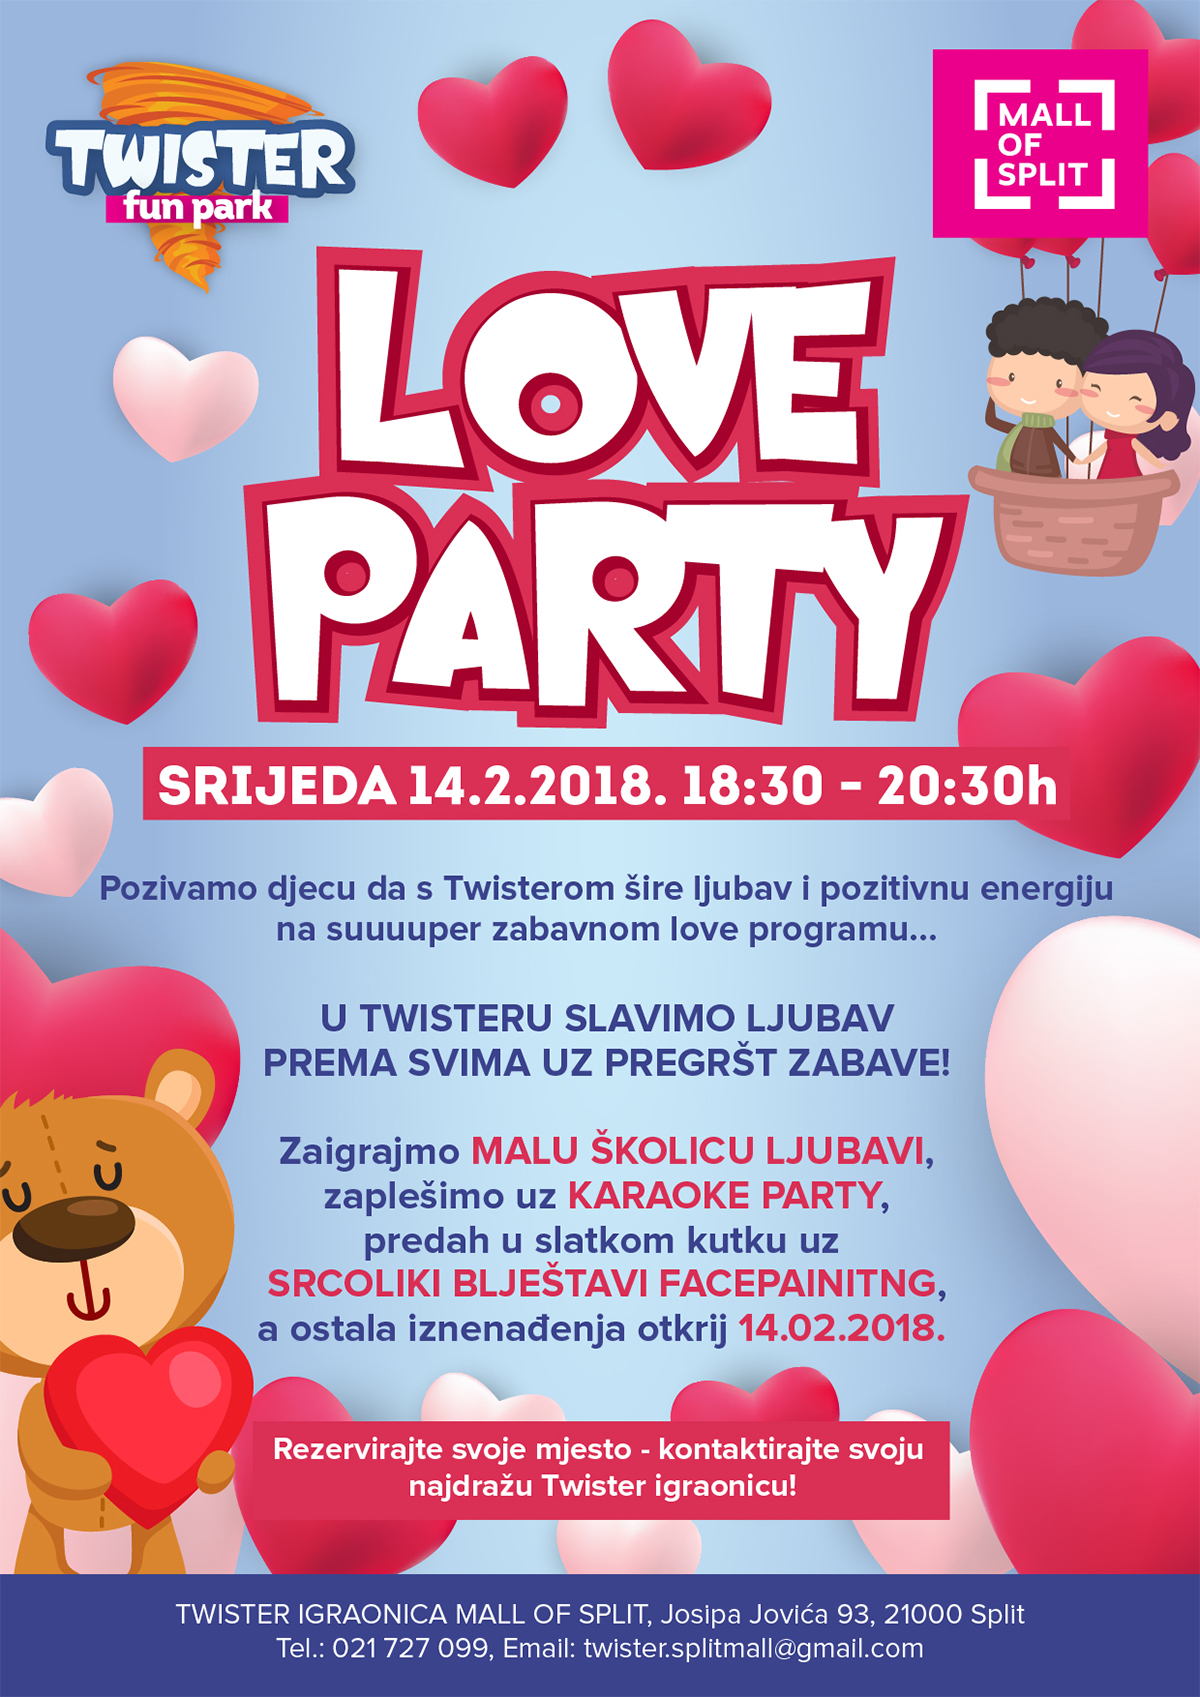 twister love party split djeca zabava dogadanja